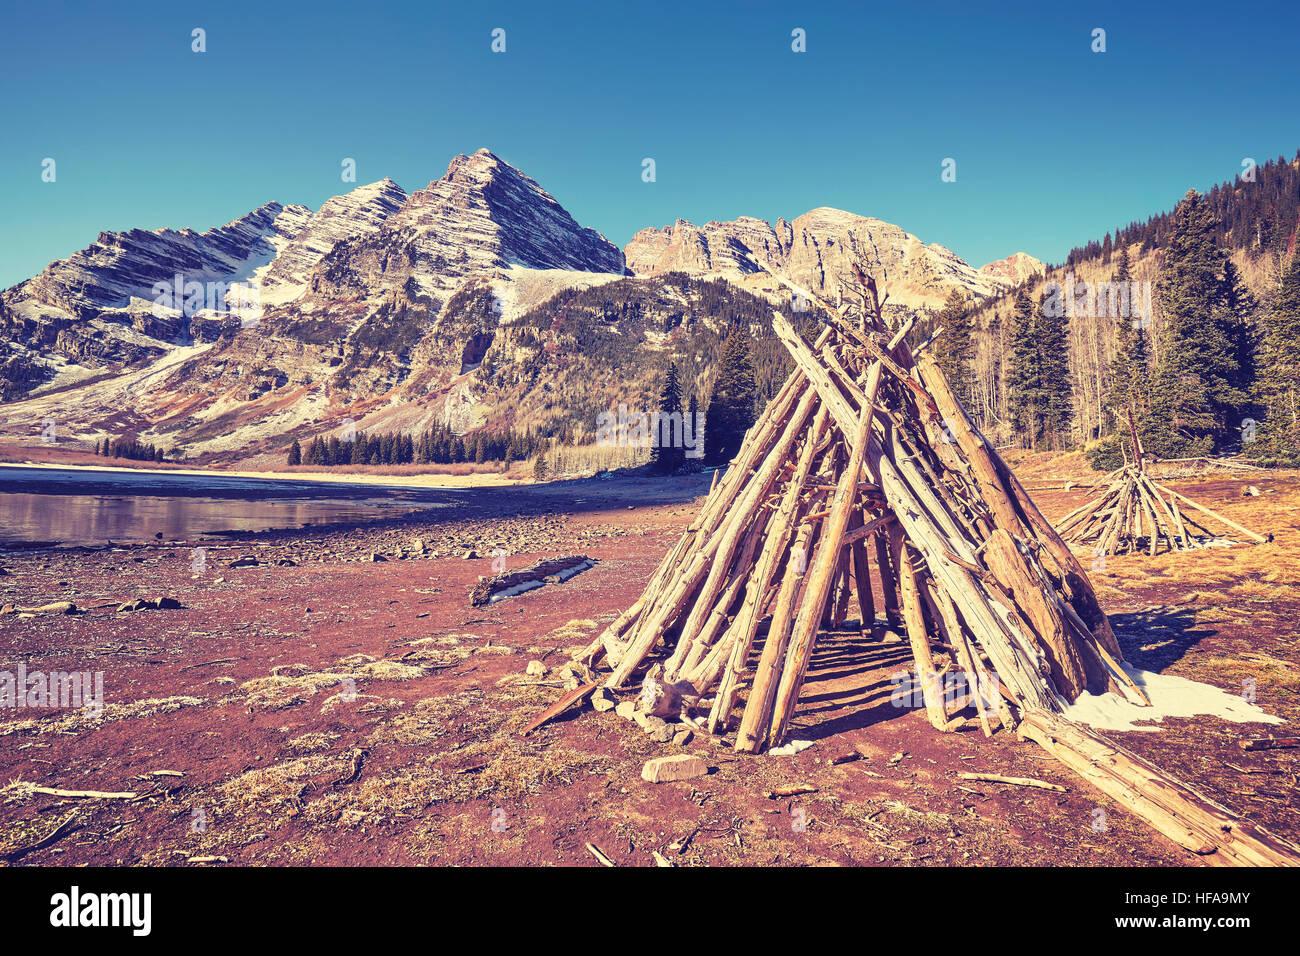 Vintage toned campsite at Maroon Bells, Aspen in Colorado, USA. - Stock Image